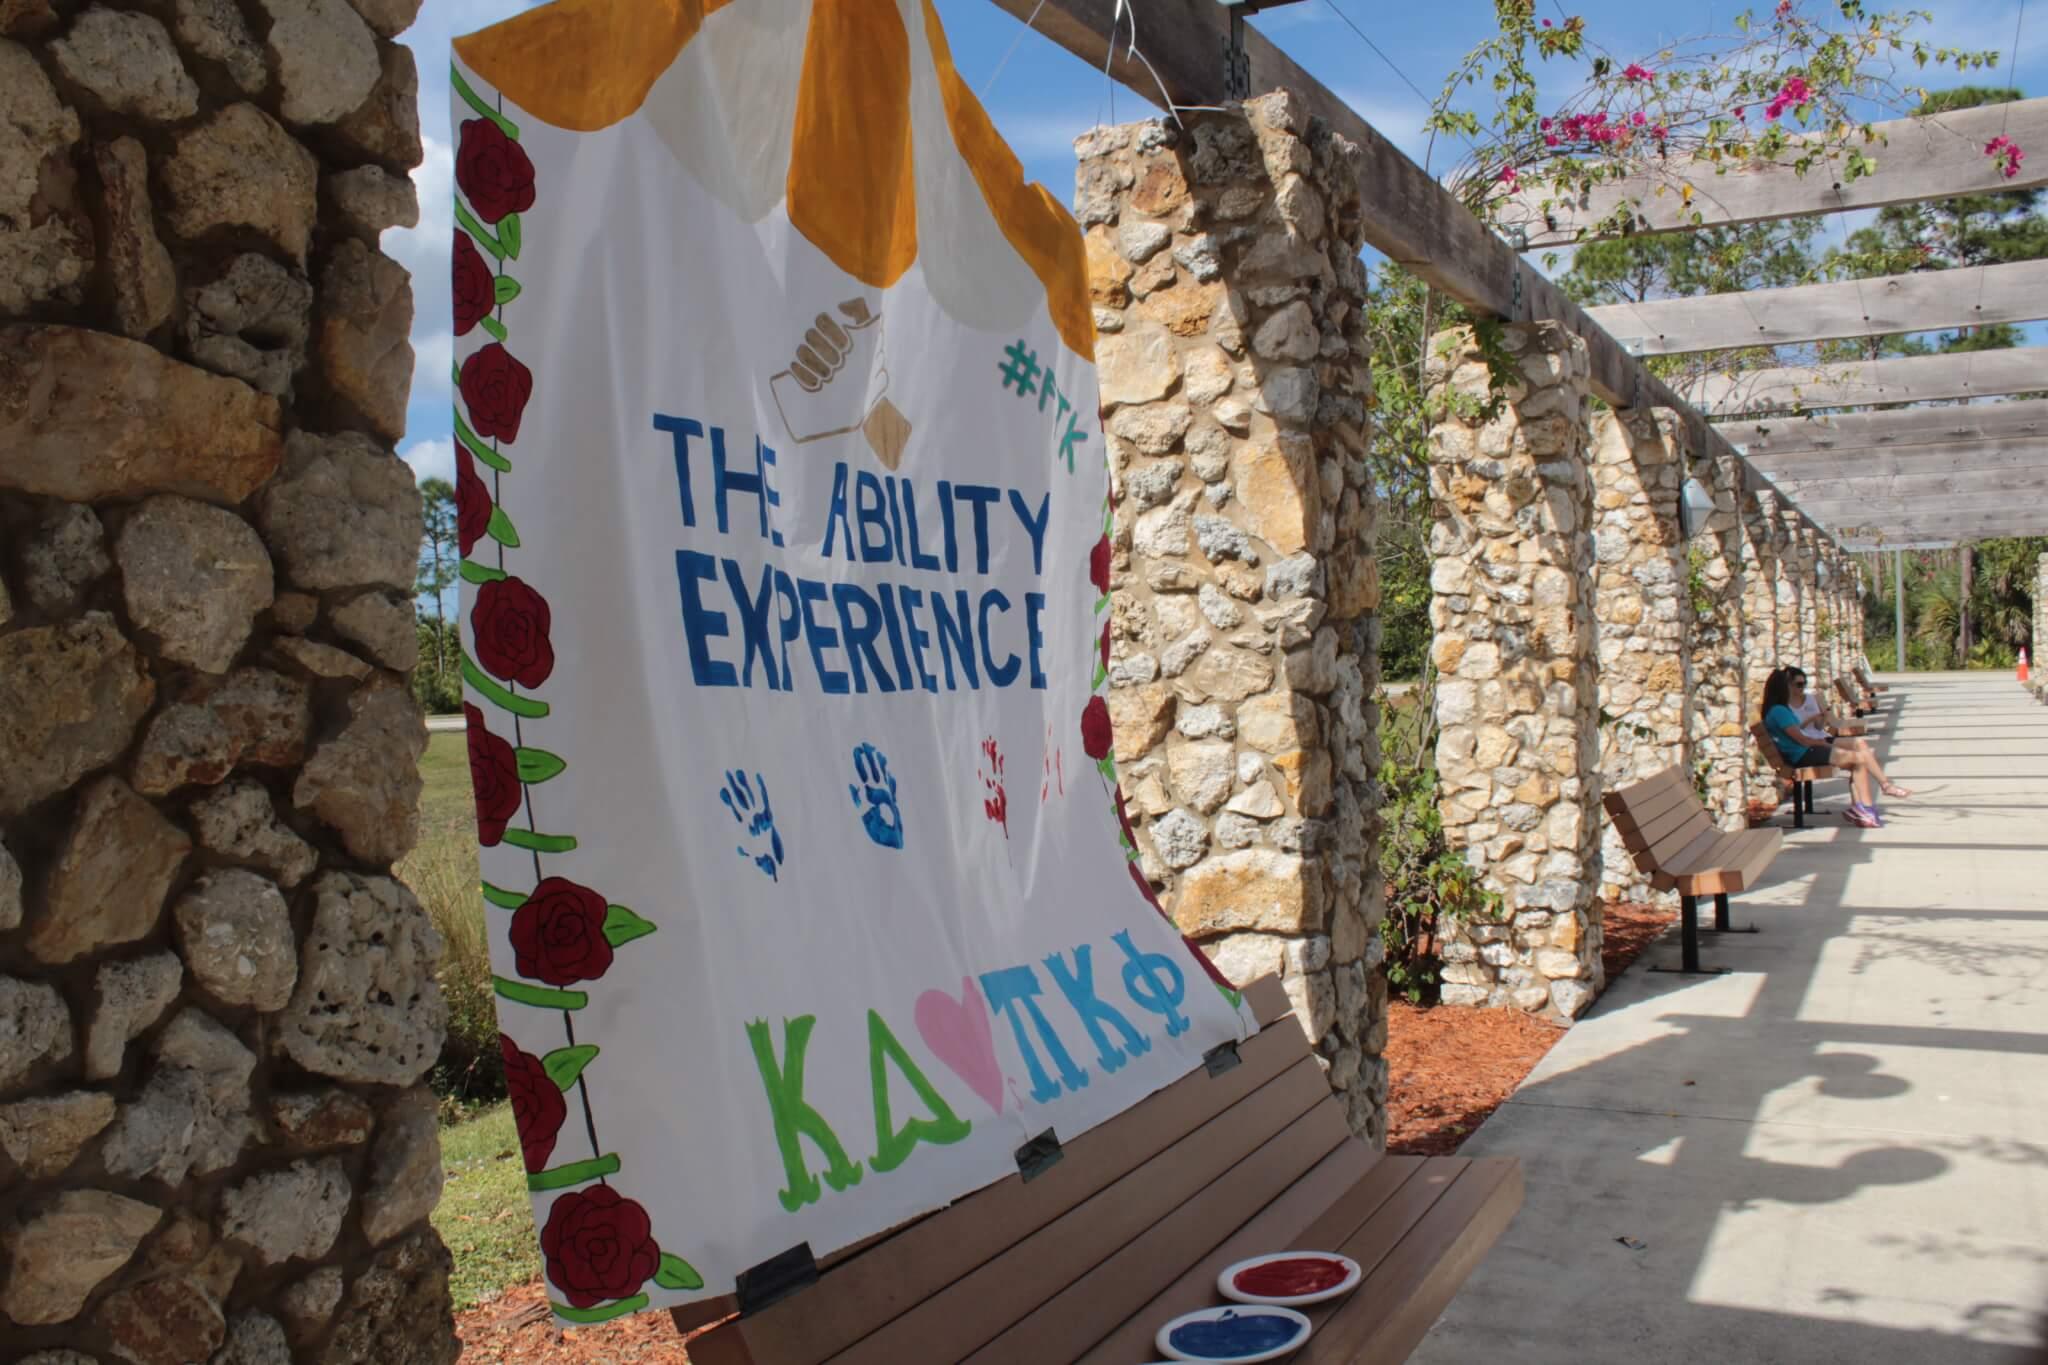 Pi Kappa Phi fights to spread positivity